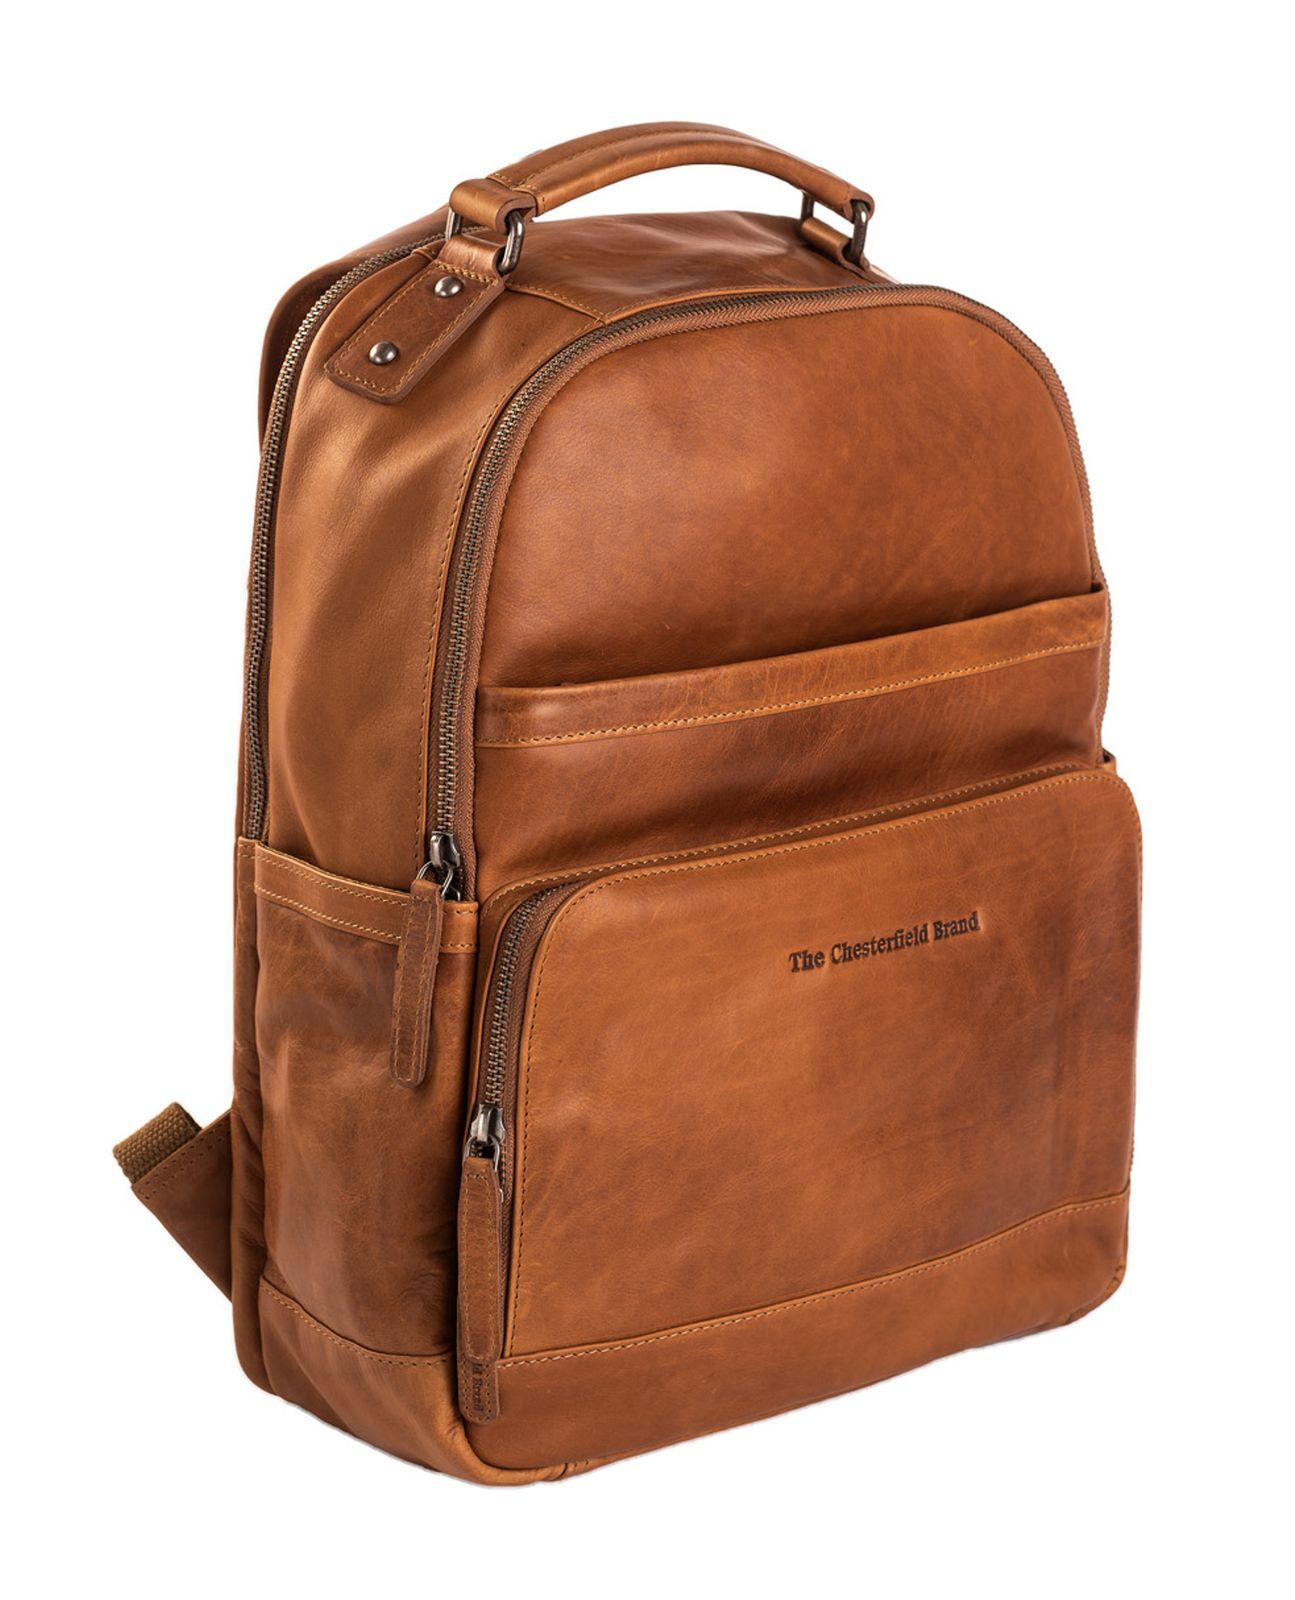 ce4847bdf24 The Chesterfield Brand Austin Backpack Cognac